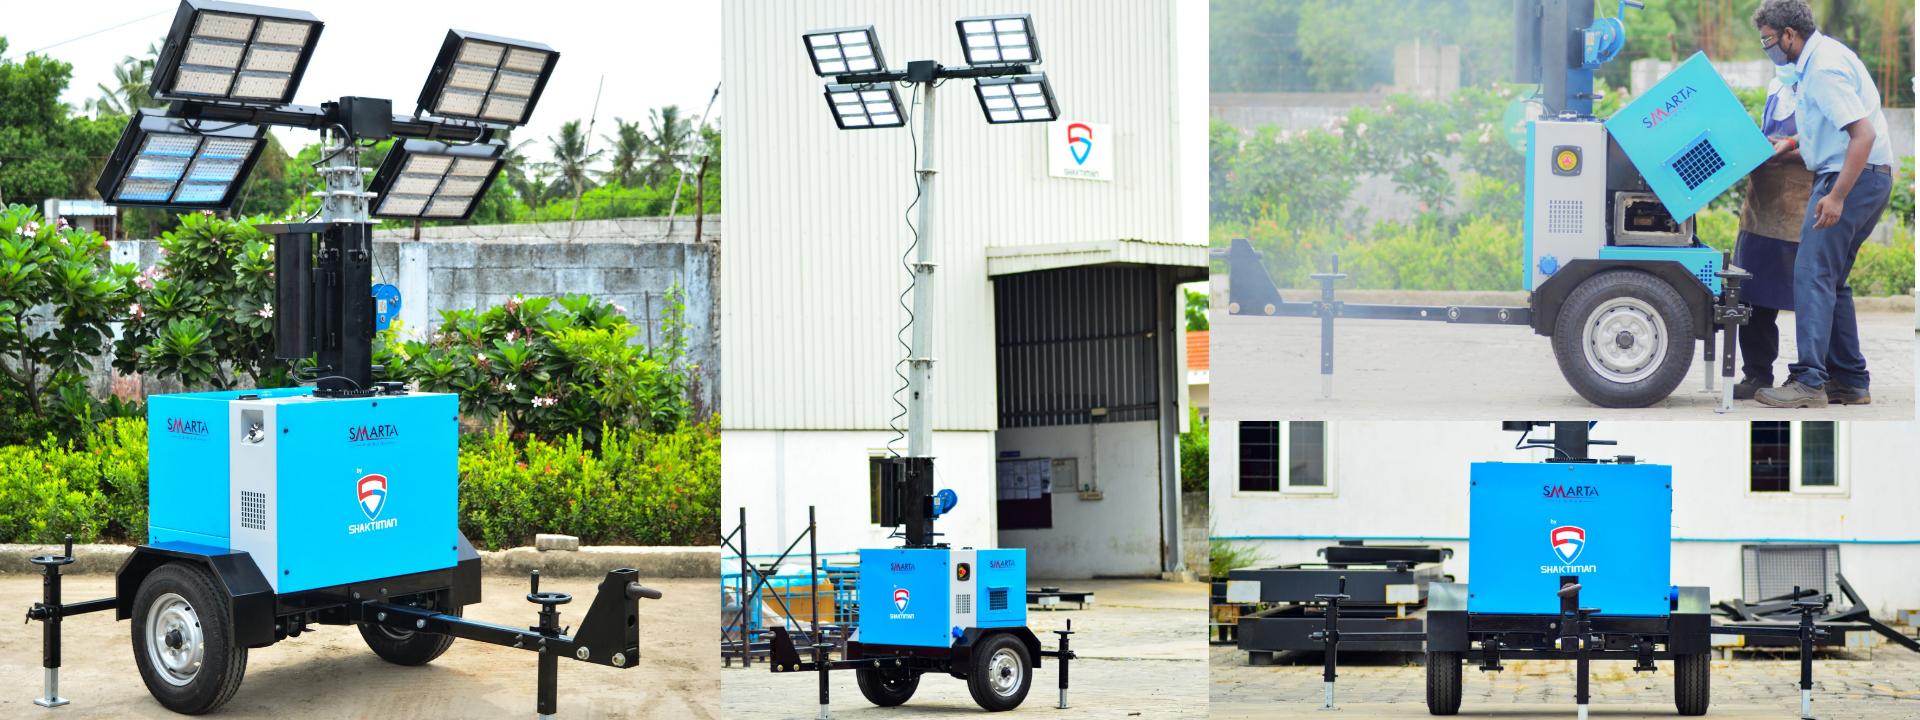 Mobile Light tower dealers